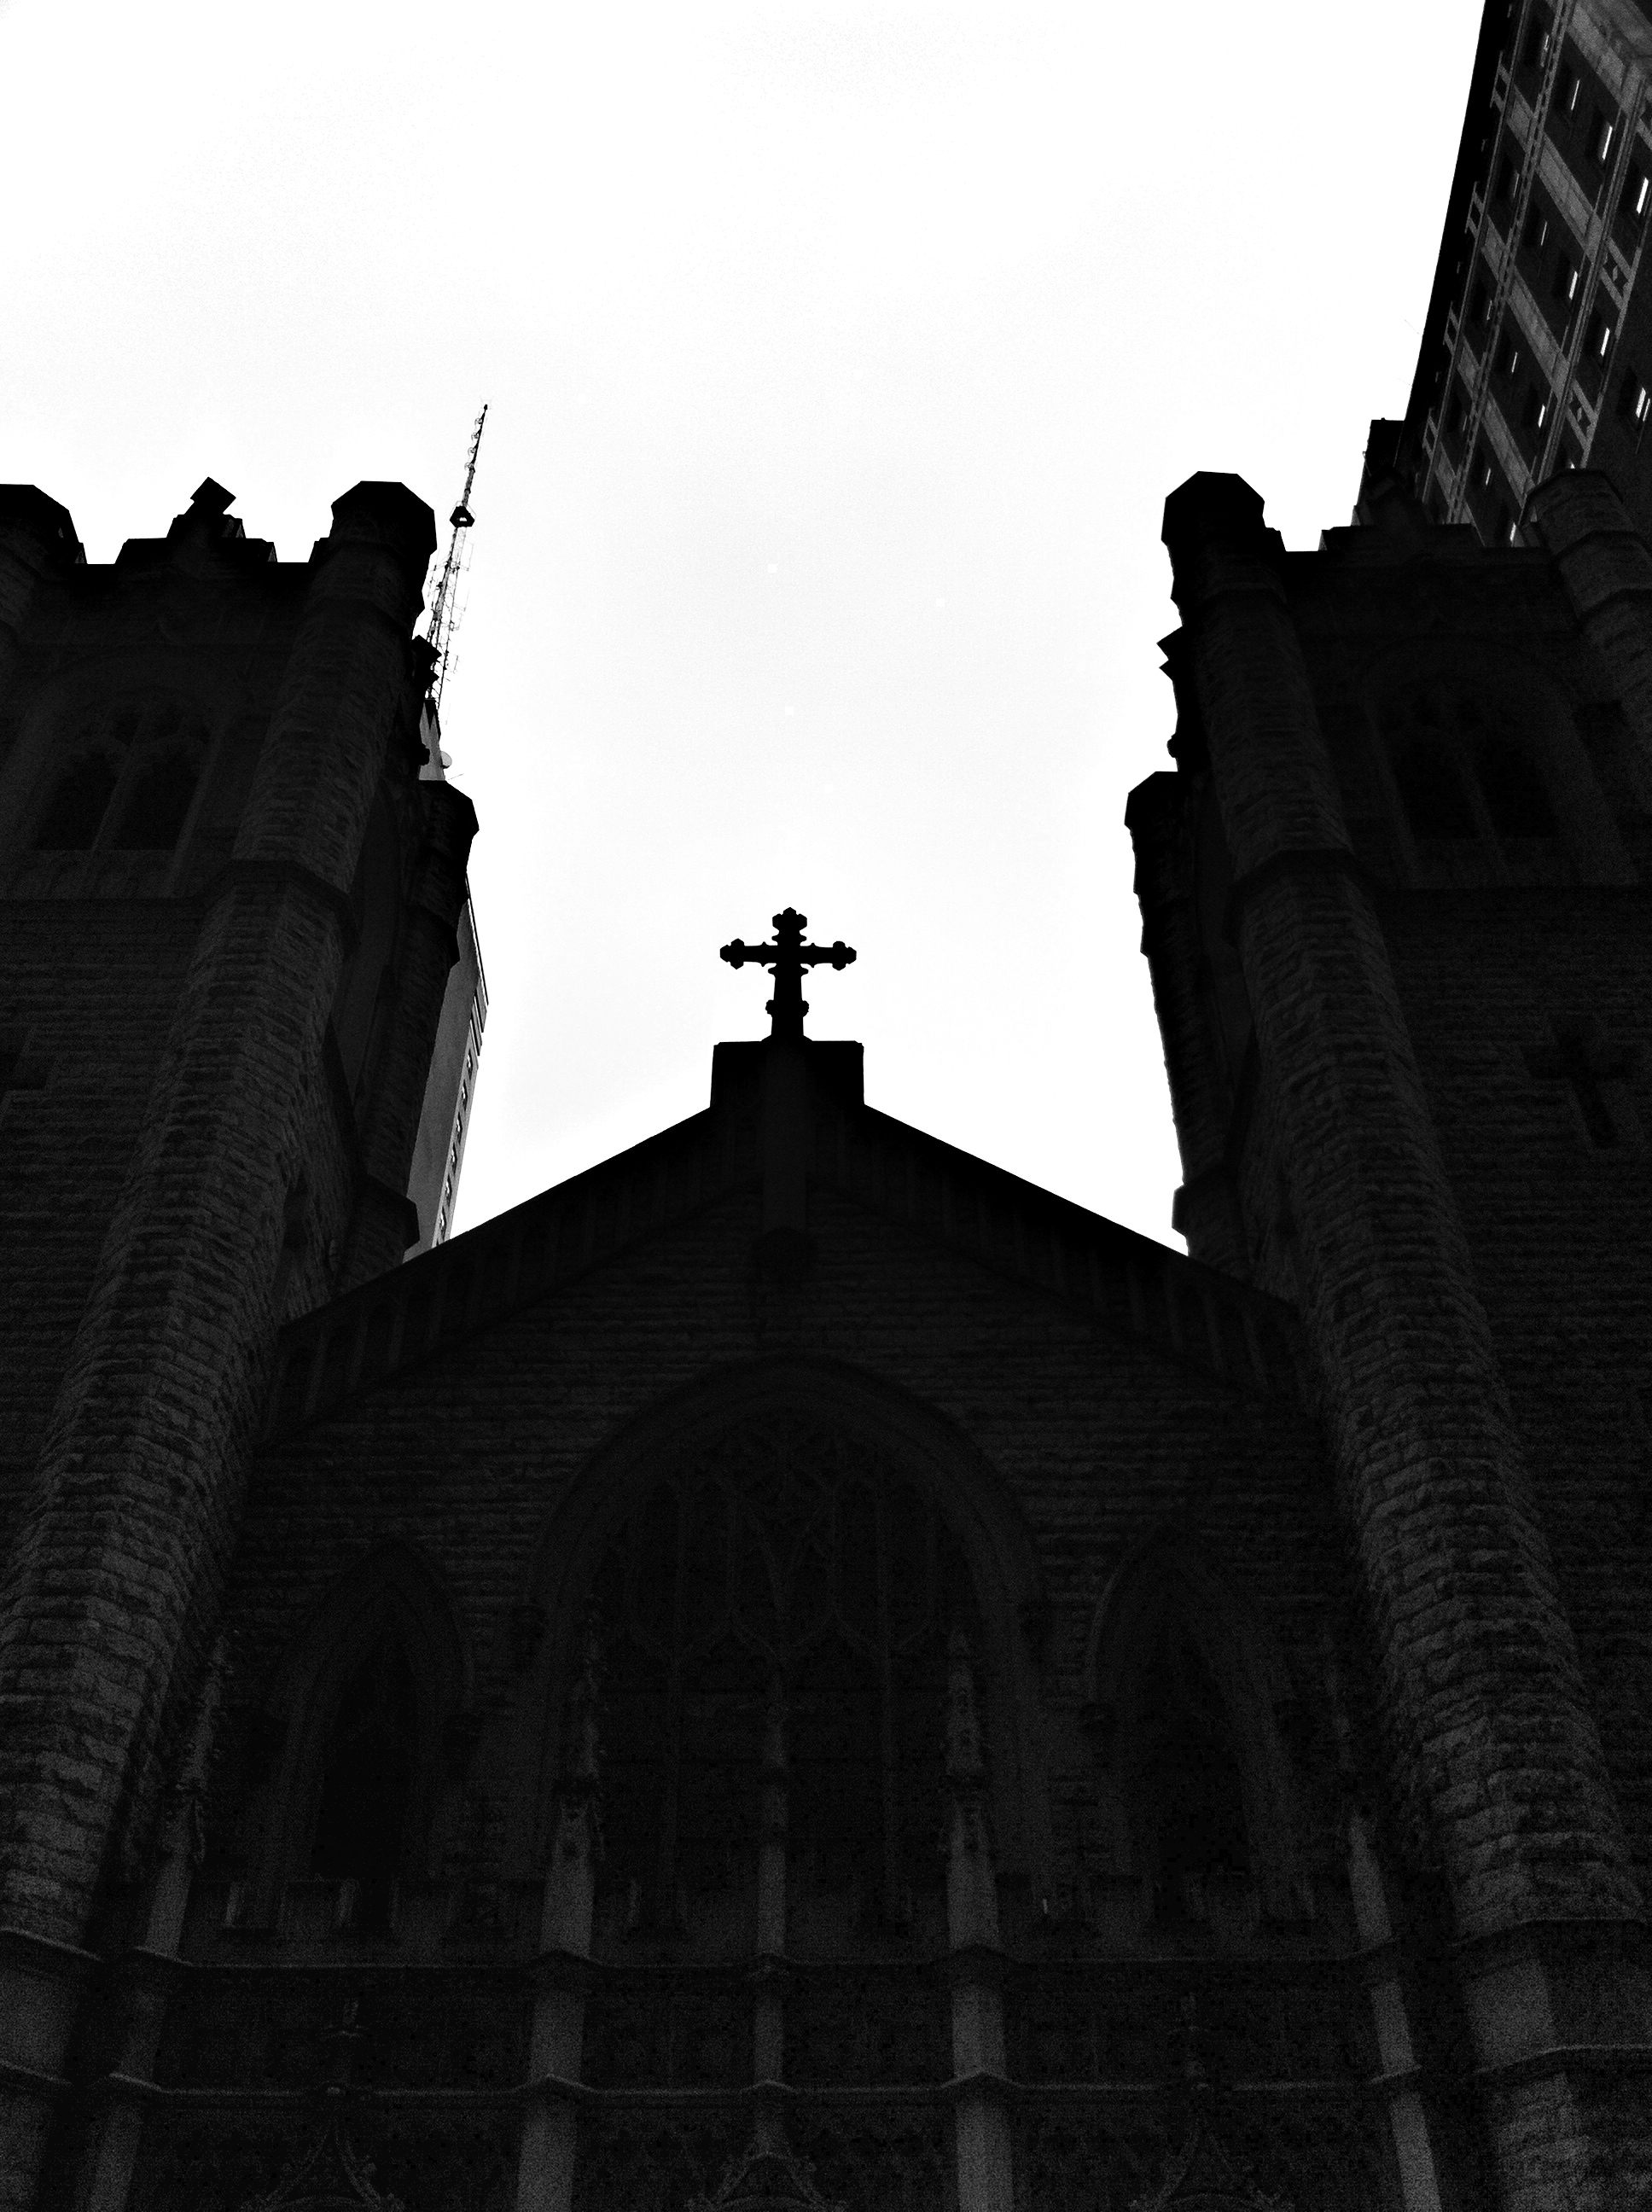 church-philly-bw-cross-market-east